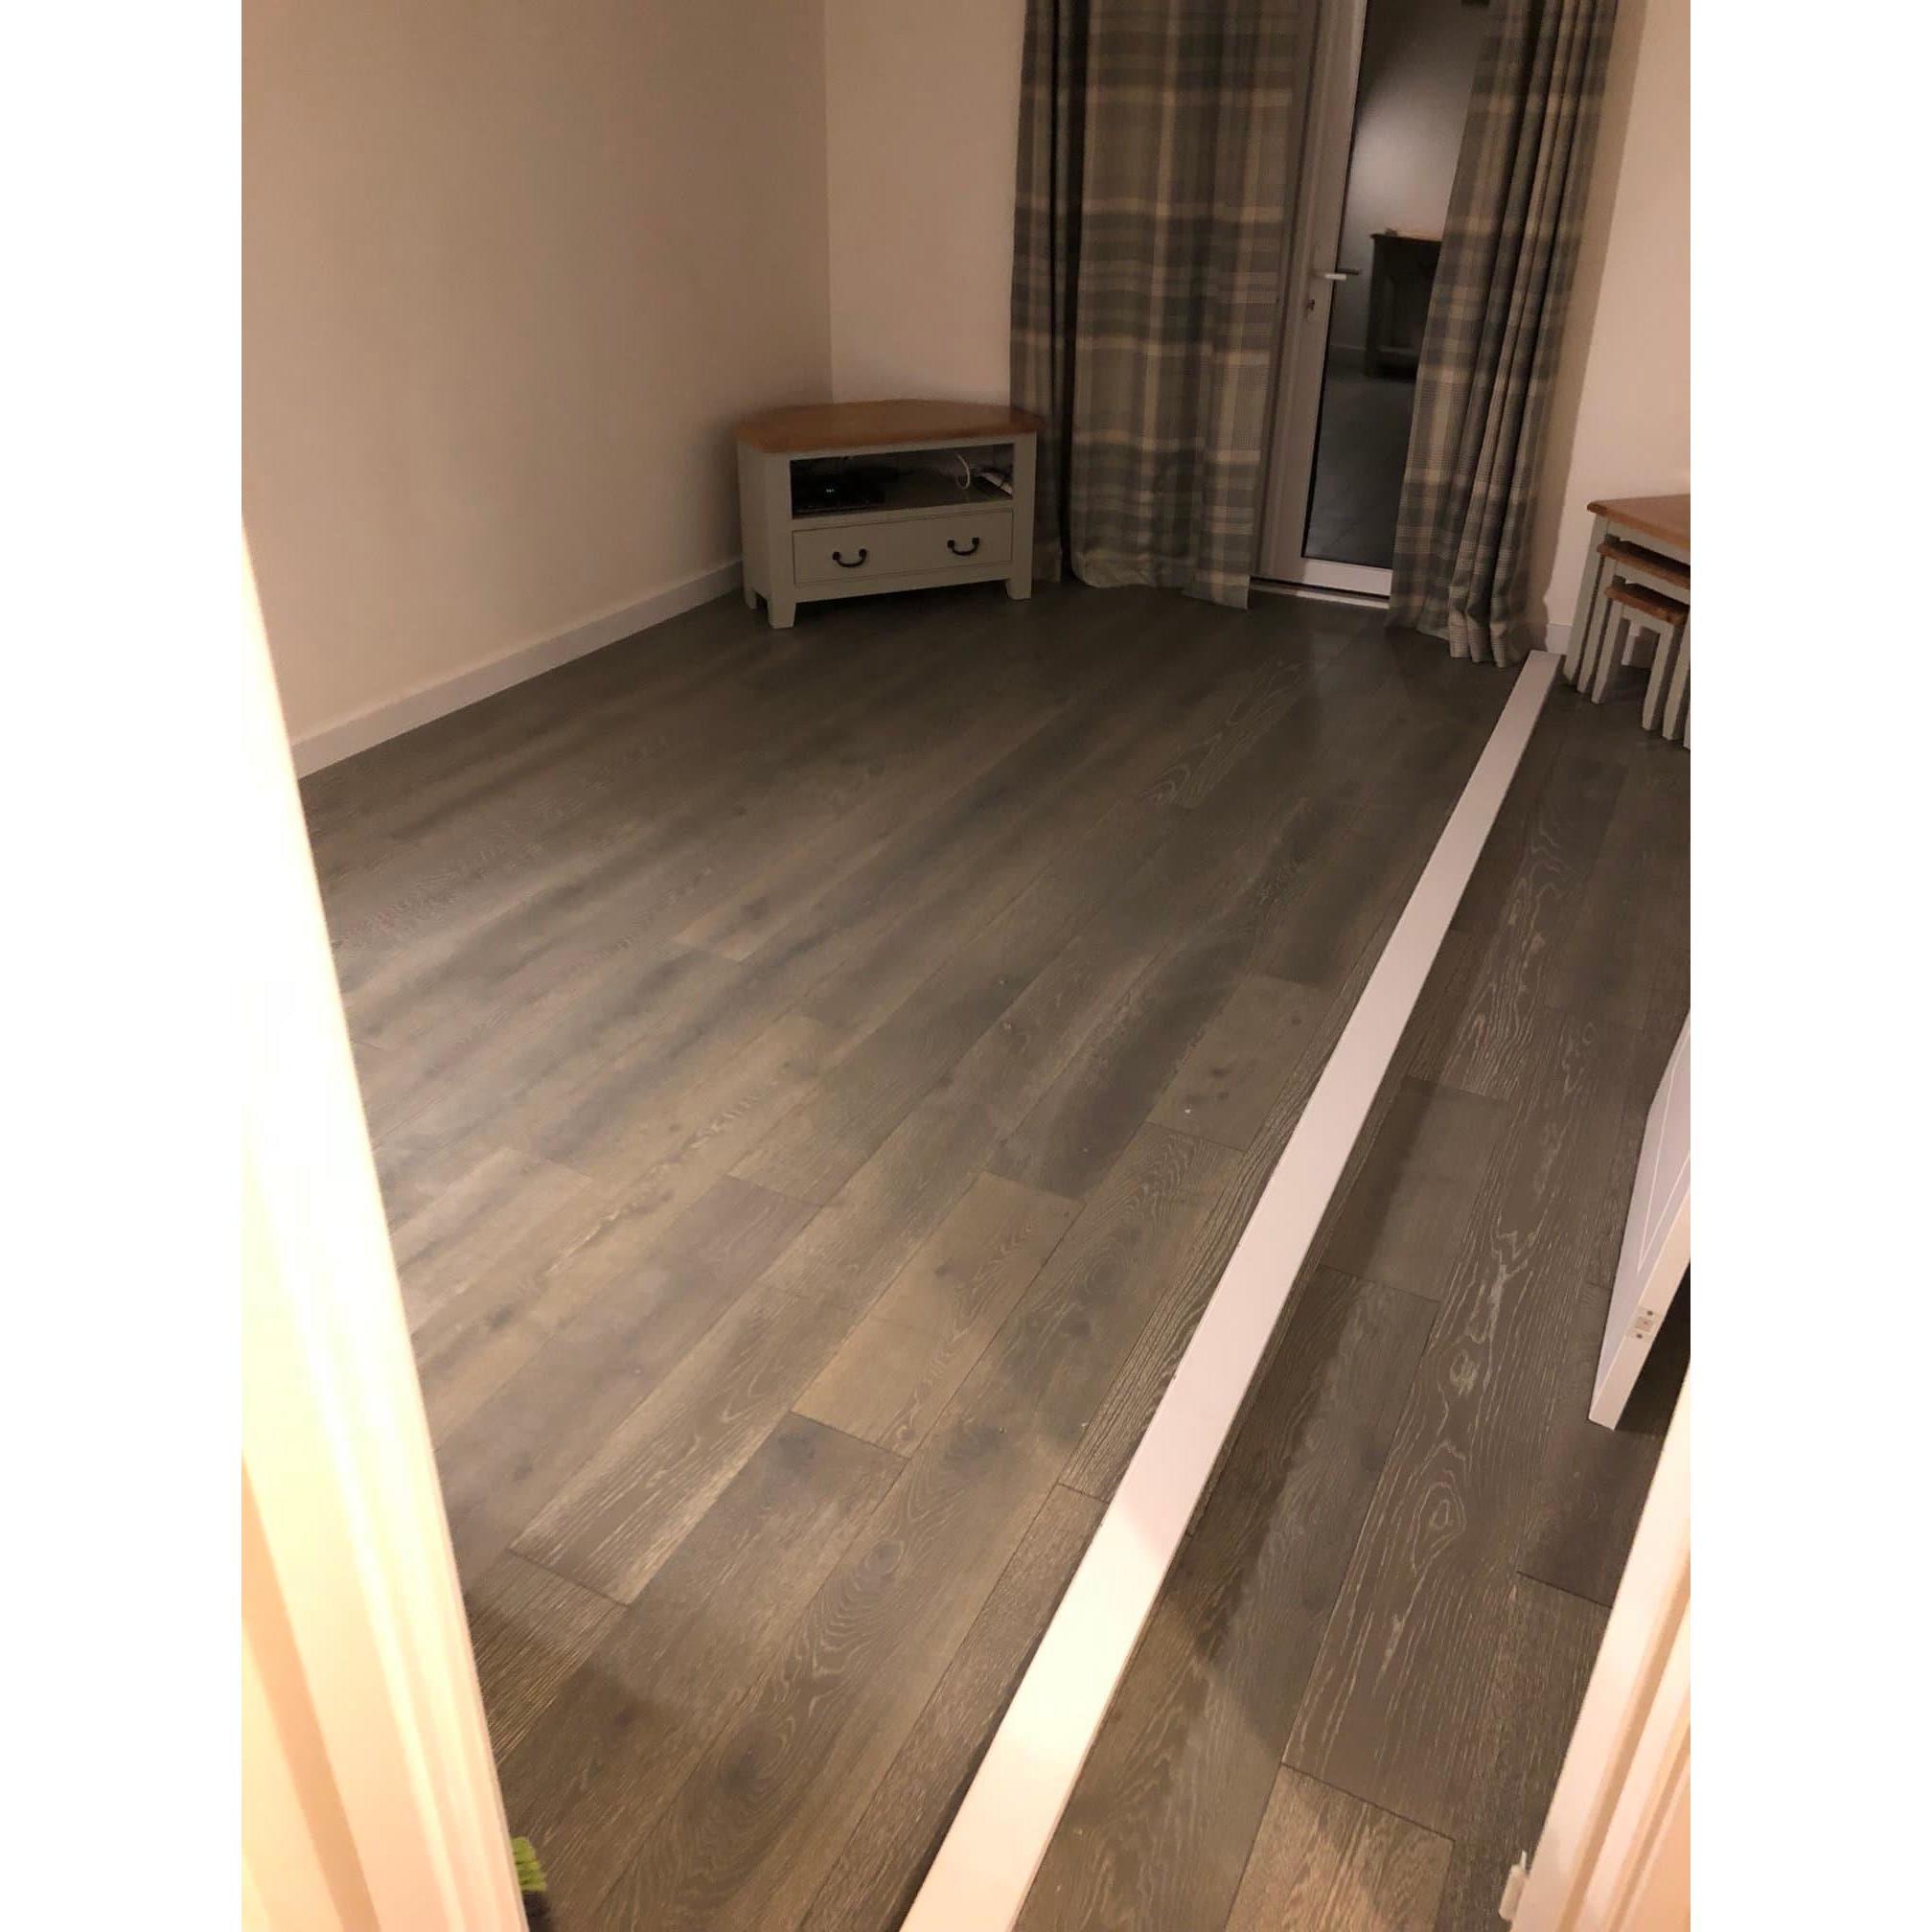 flooring pattern fl floor beige jacksonville services five parquete soft carpet with contractors laminate marble tile star